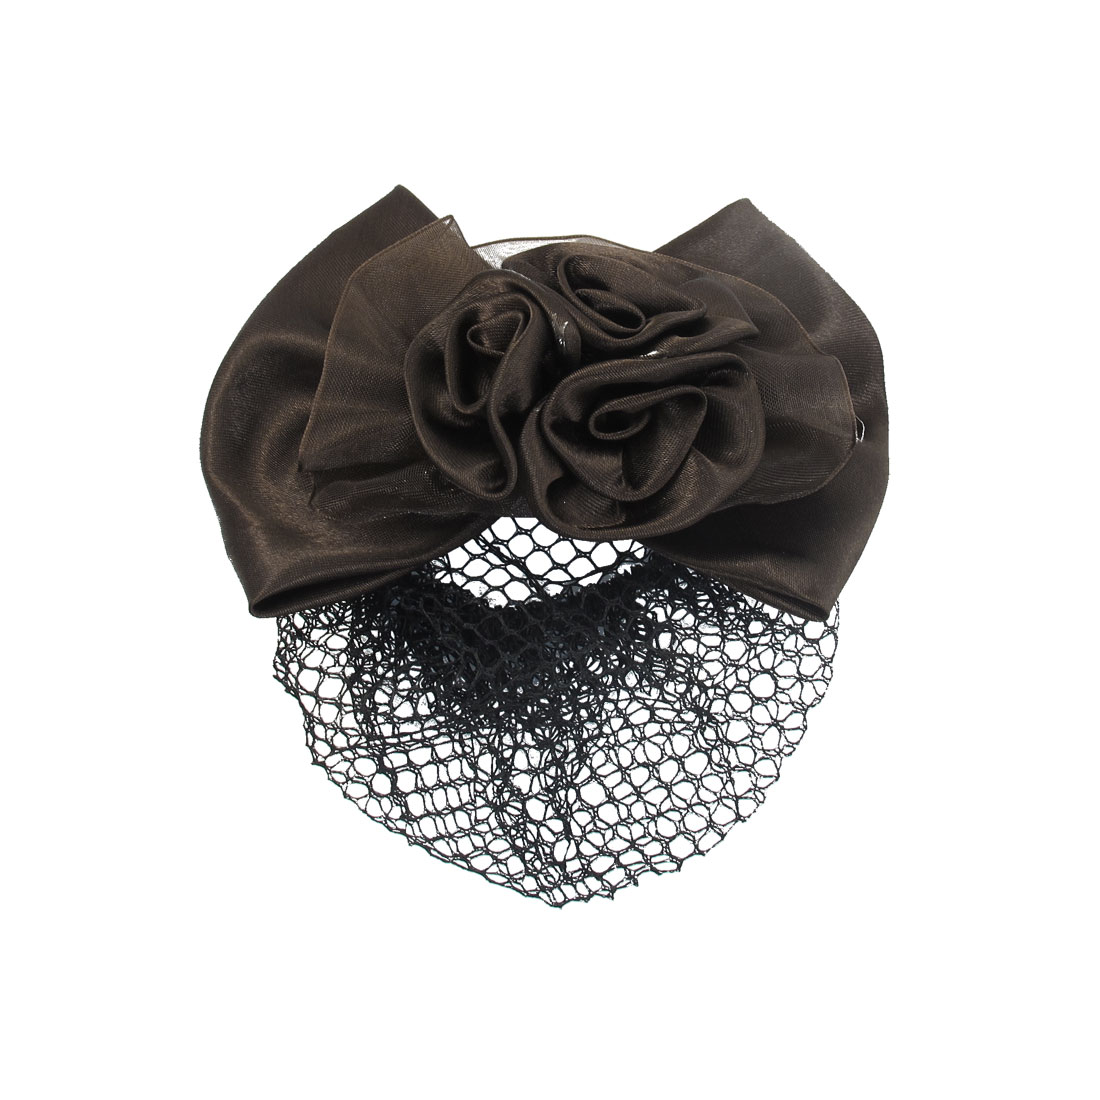 Unique Bargains Charming Coffee Color Flower Design Headdress Hair Band Hairnet